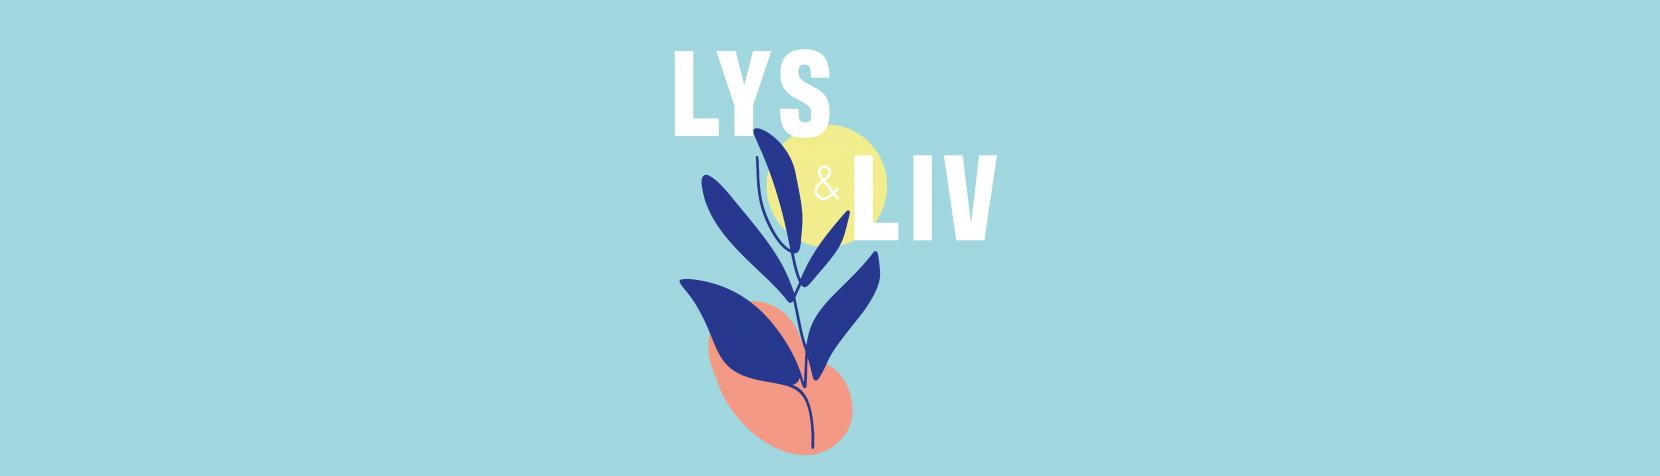 Lys & Liv i Rudersdal